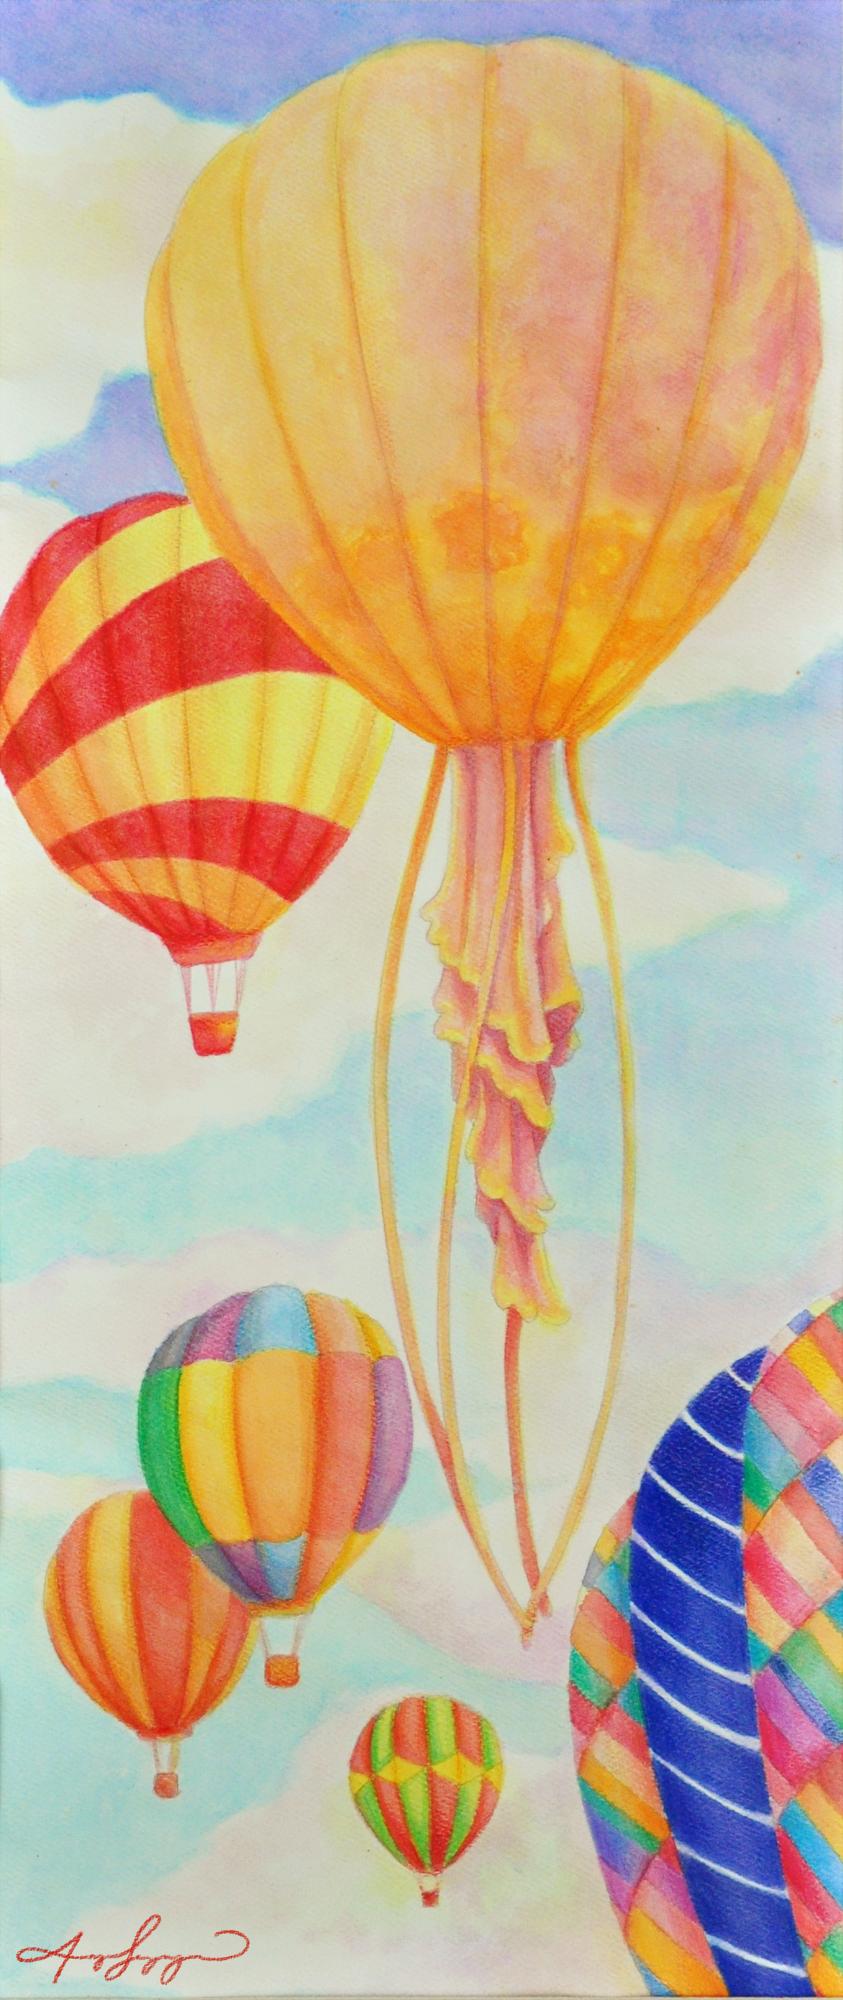 Jellyballoons by pikarar